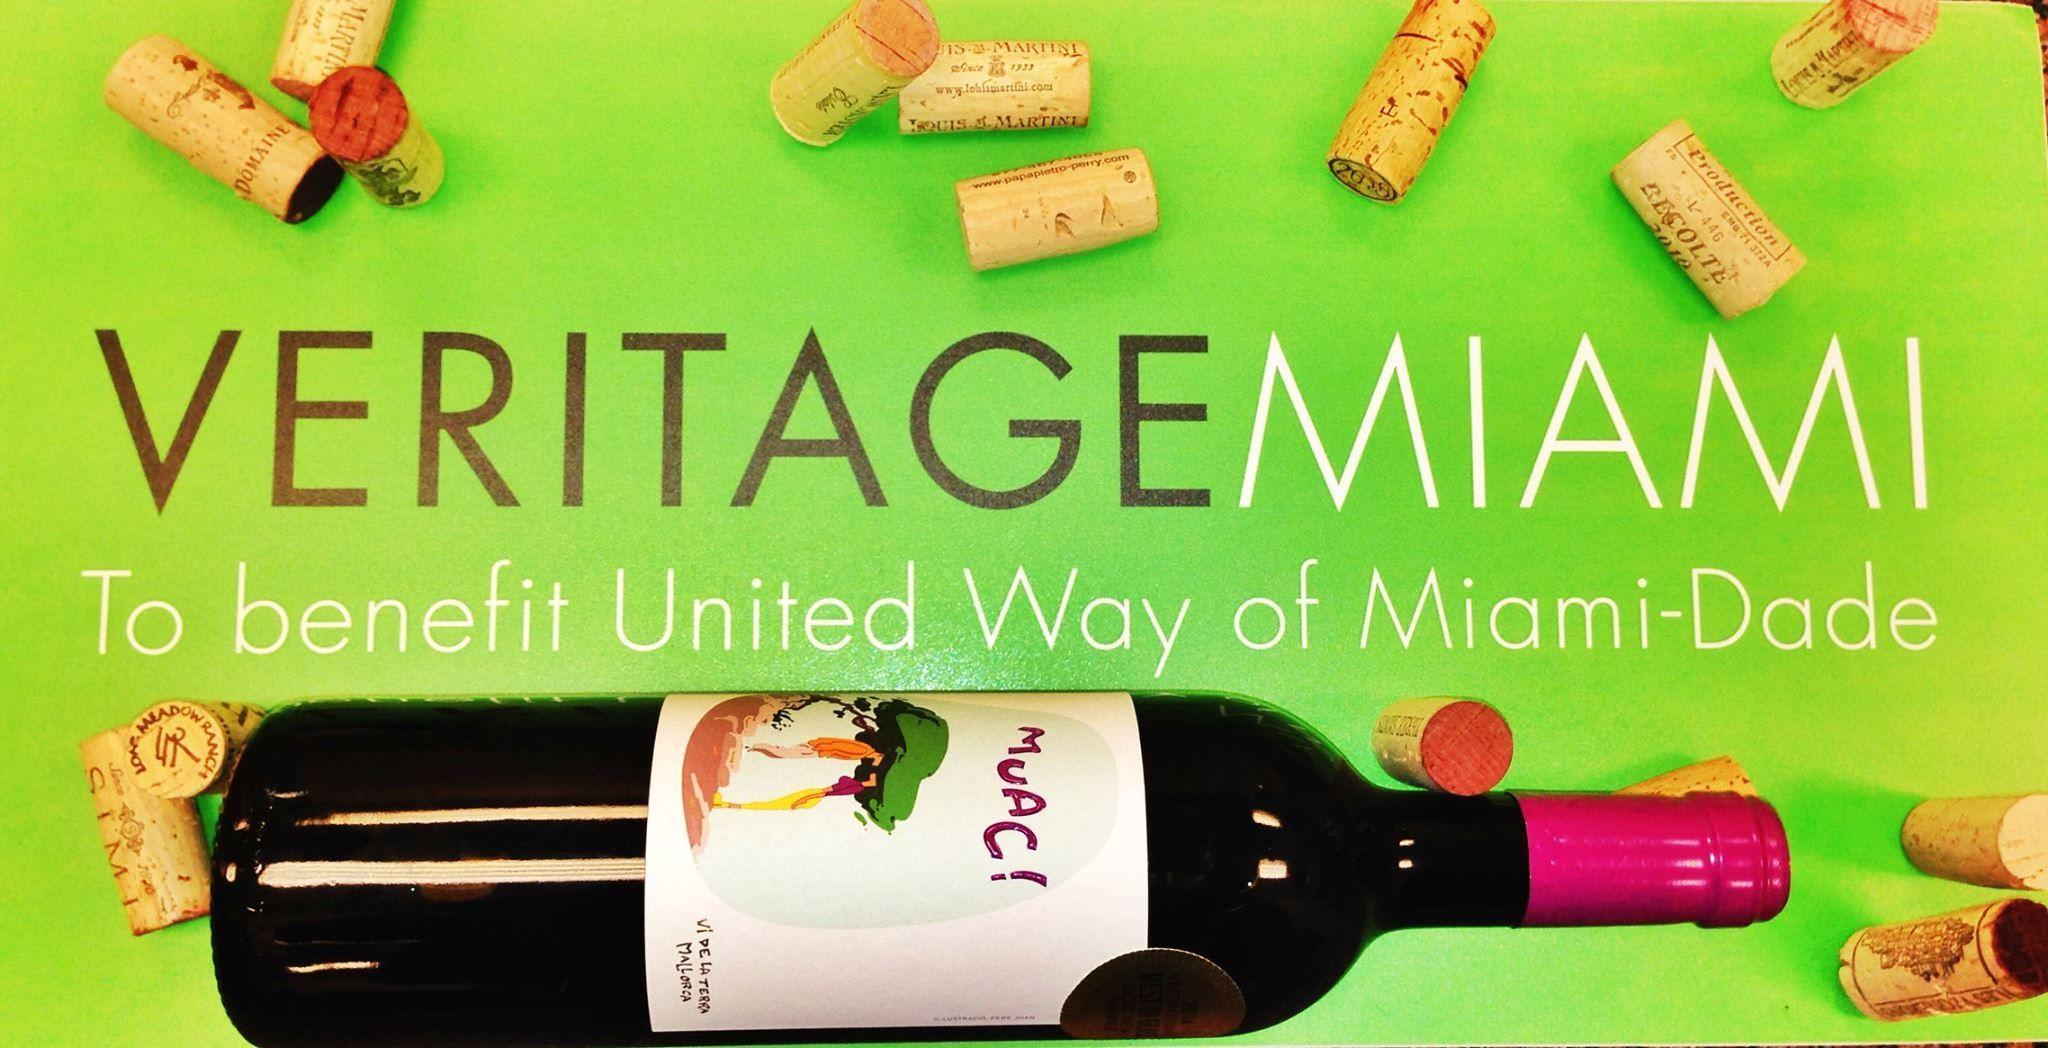 VeritageMiami to Benefit United Way of Miami-Dade!